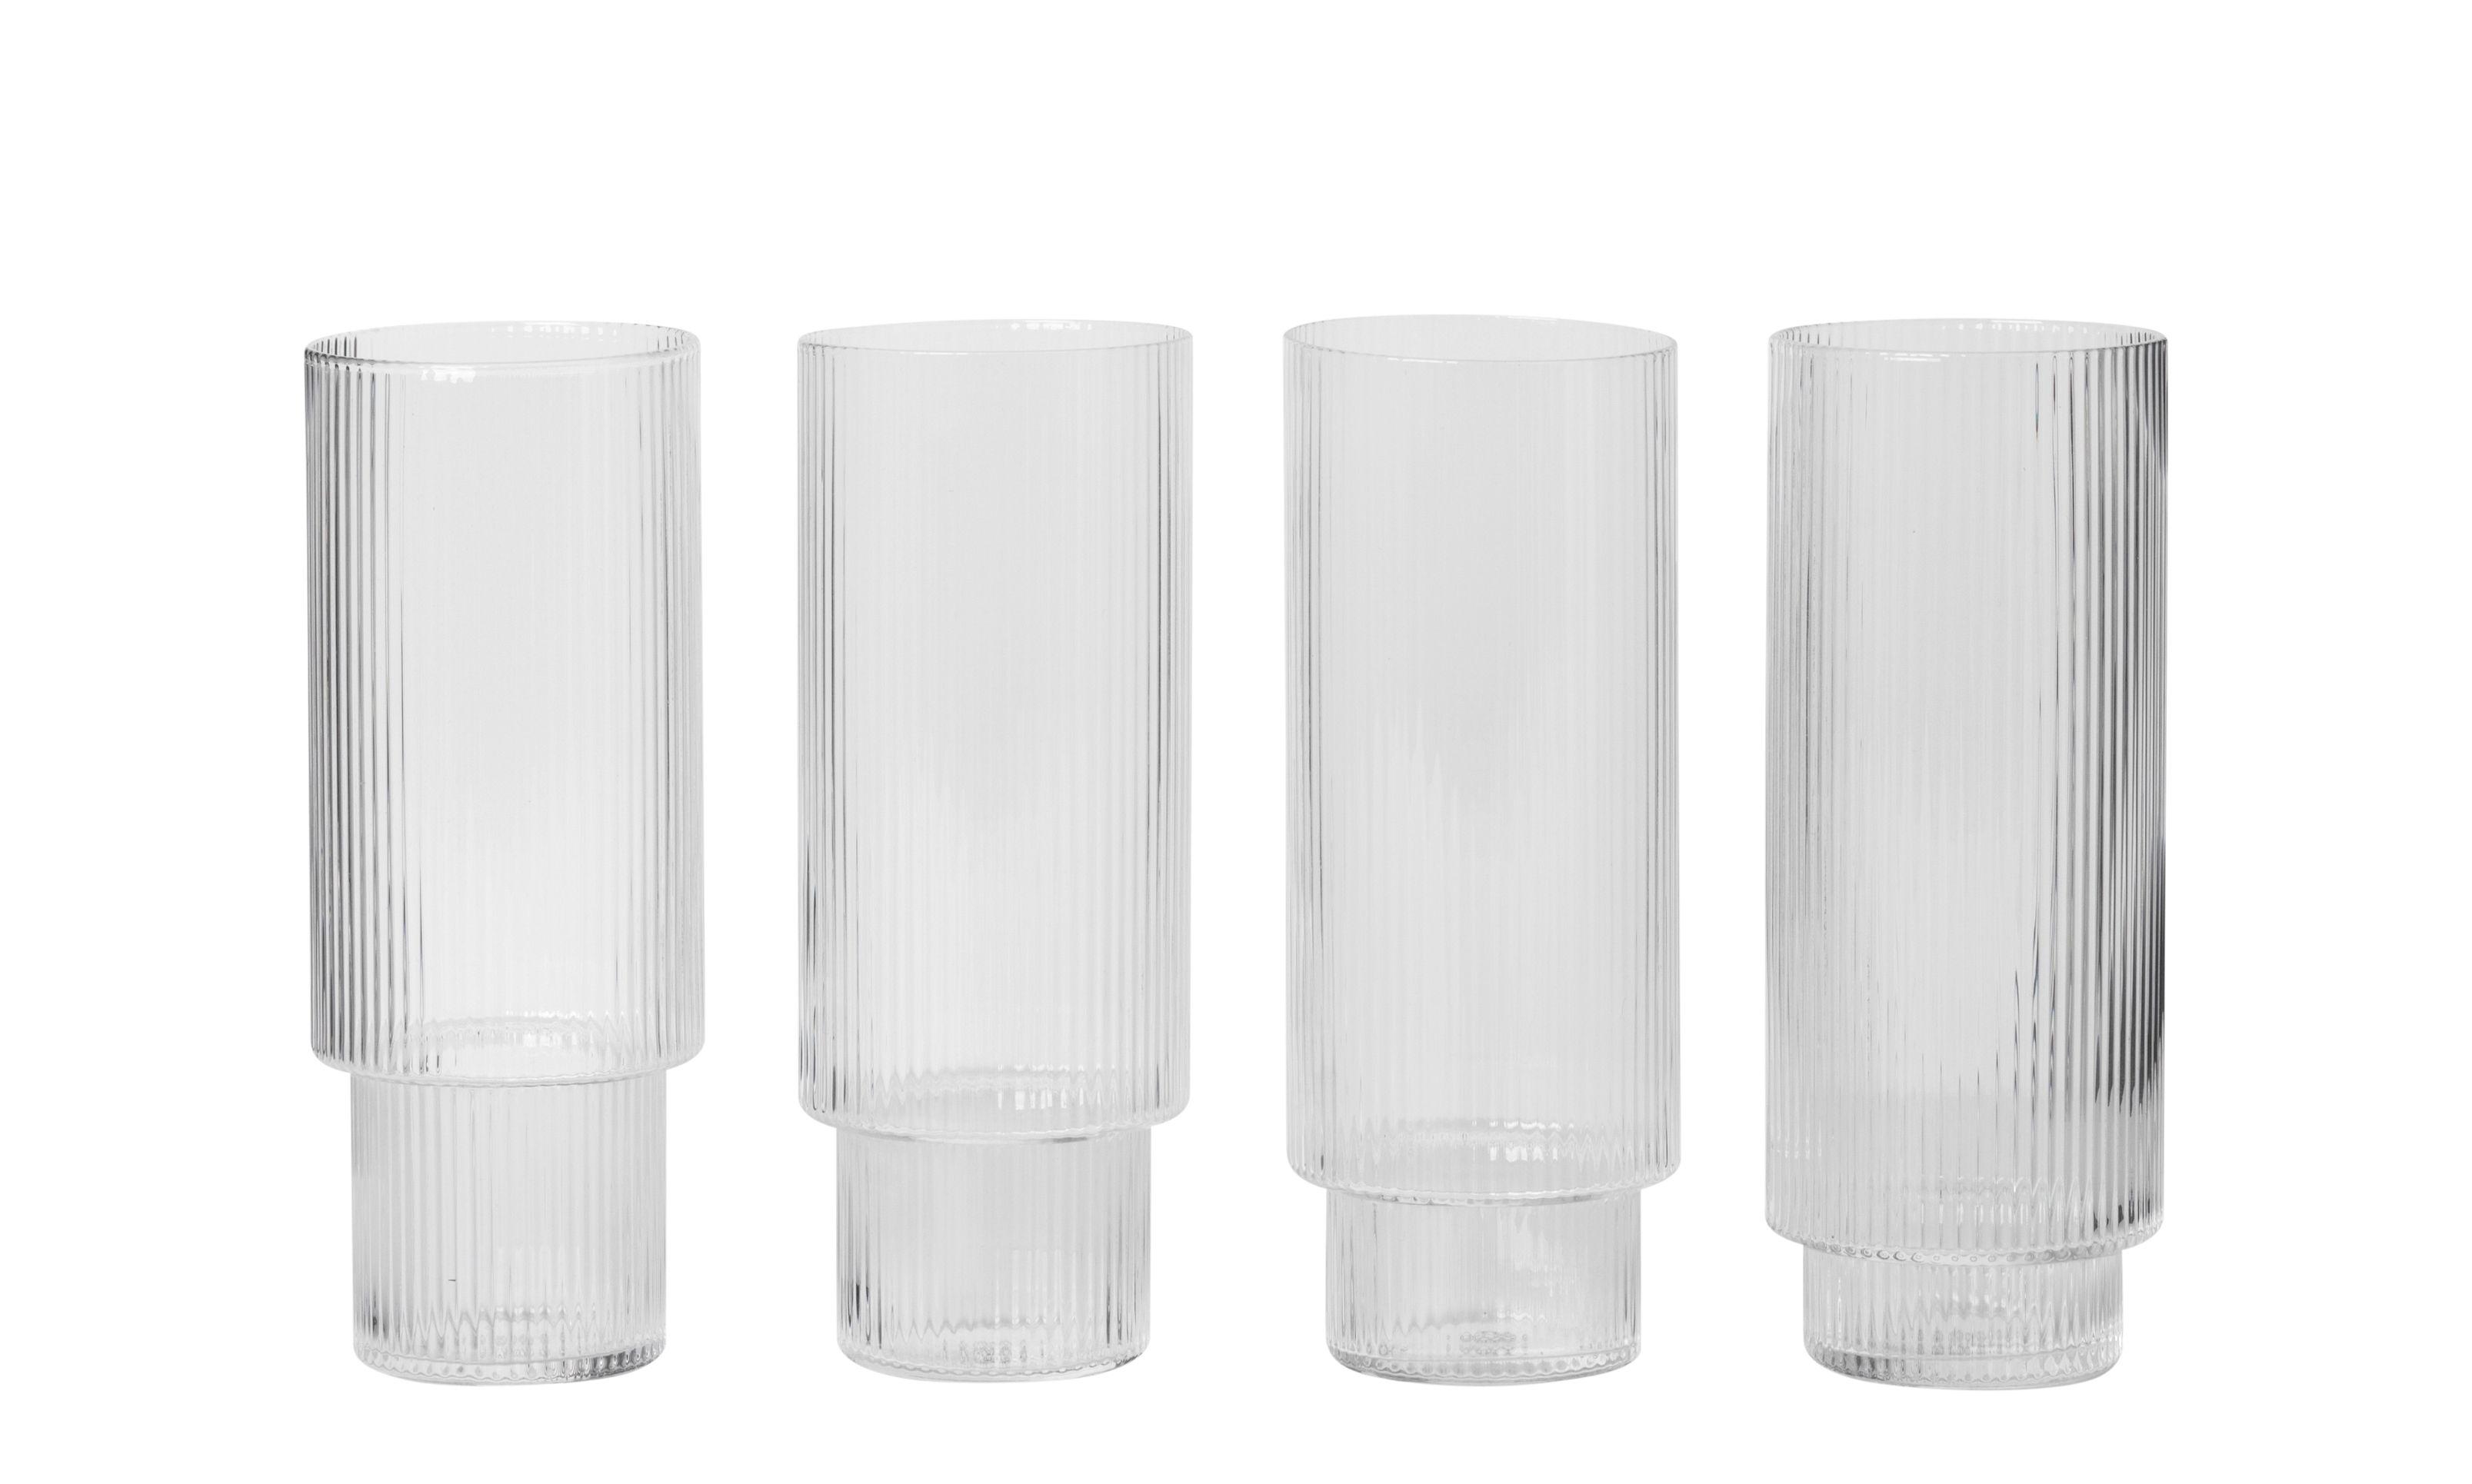 Tischkultur - Gläser - Ripple Longdrink Glas / 4er-Set - mundgeblasenes Glas - Ferm Living - Transparent / mit Rillen - mundgeblasenes Glas